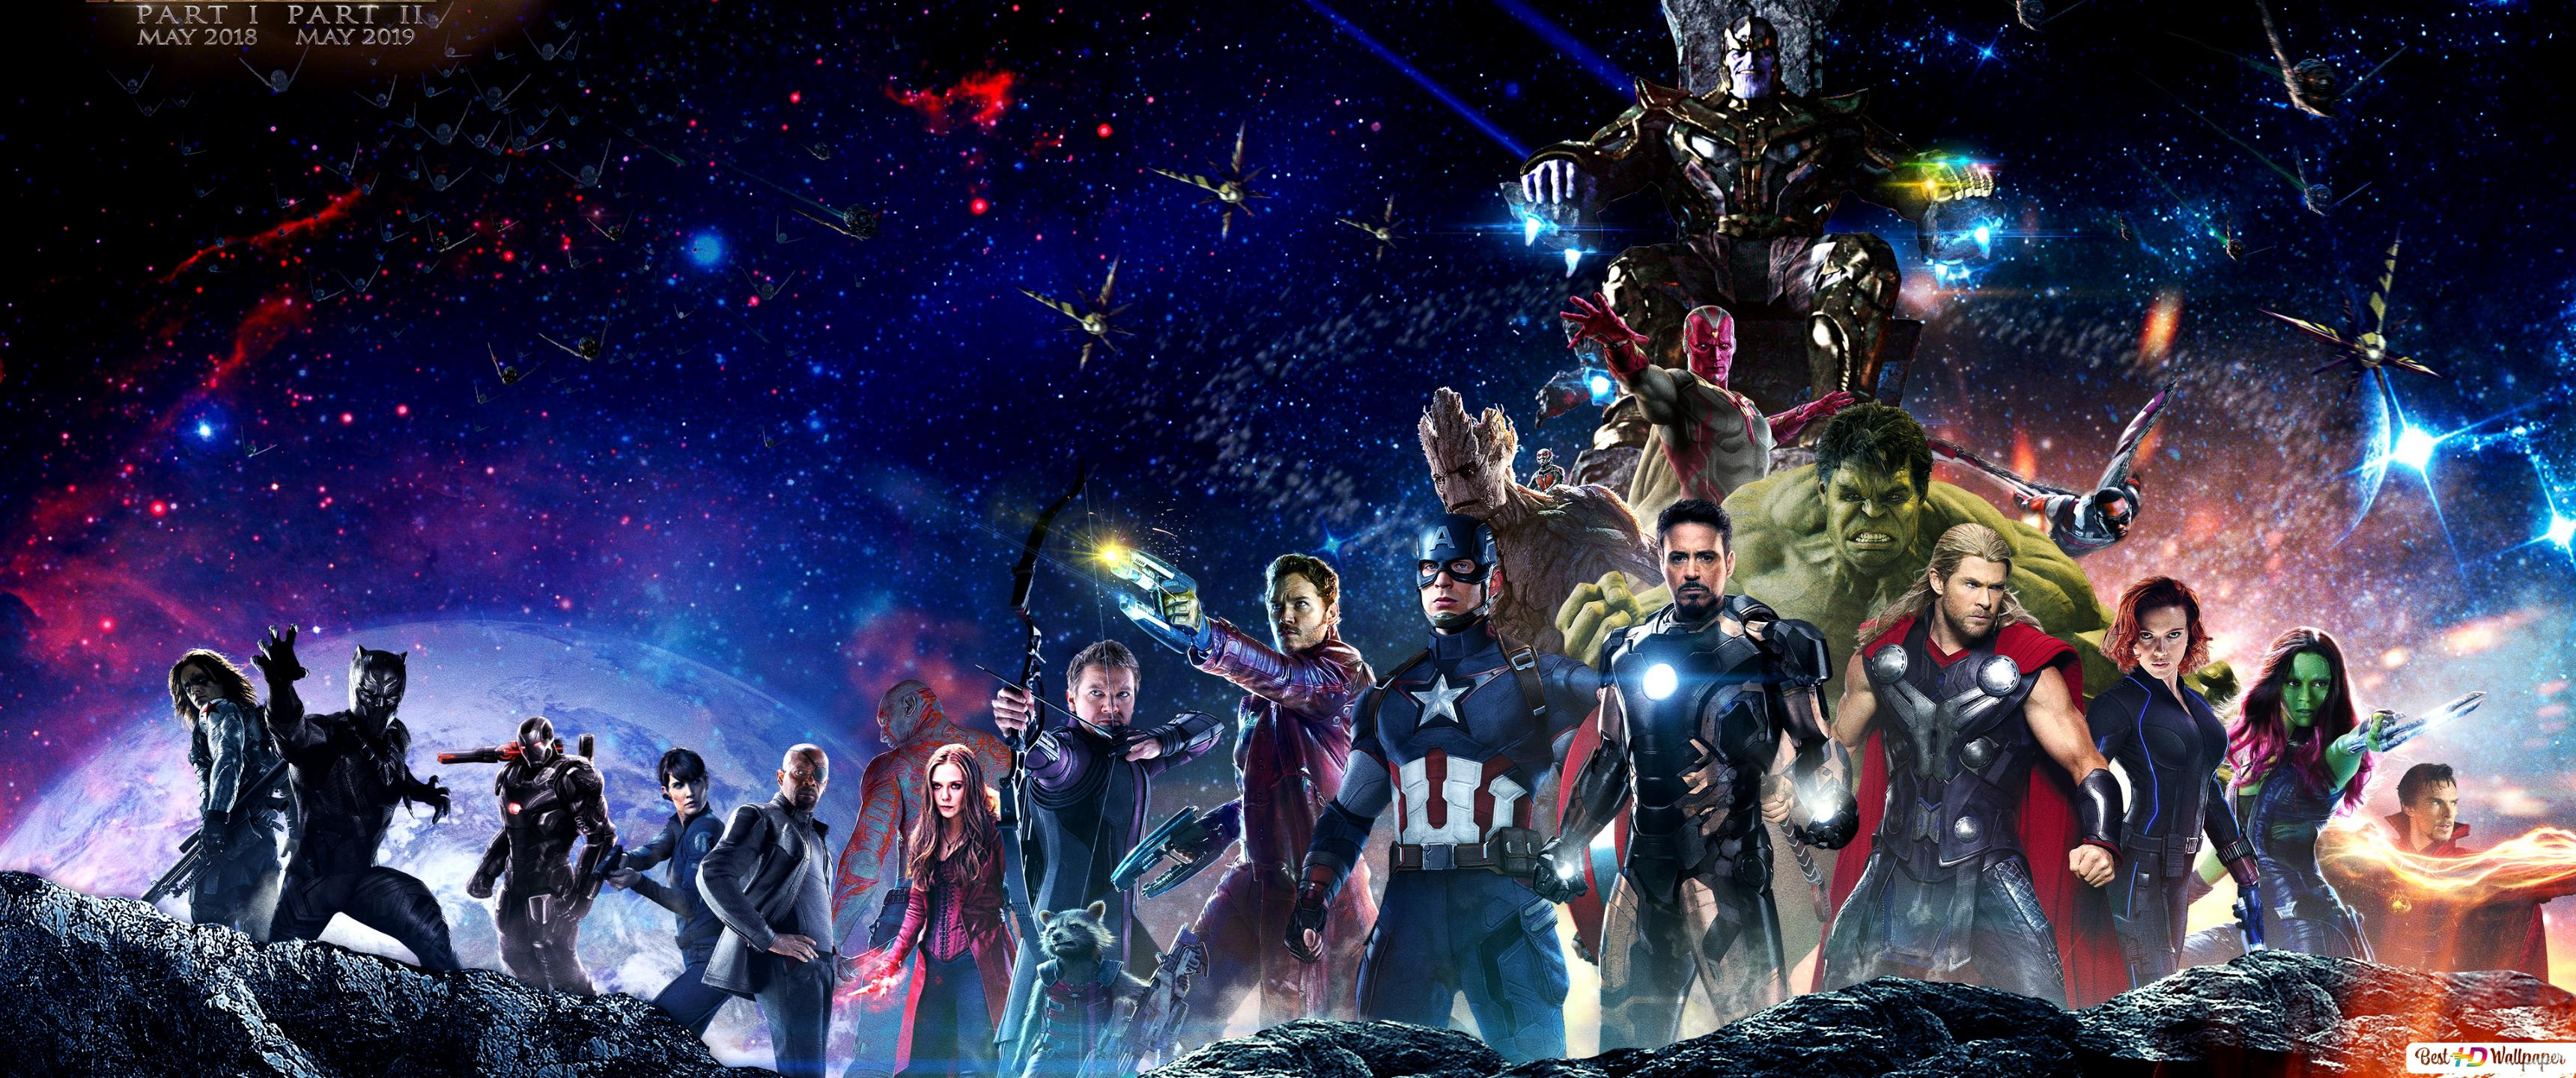 Avengers Infinity War S Heroes And Villains Hd Wallpaper